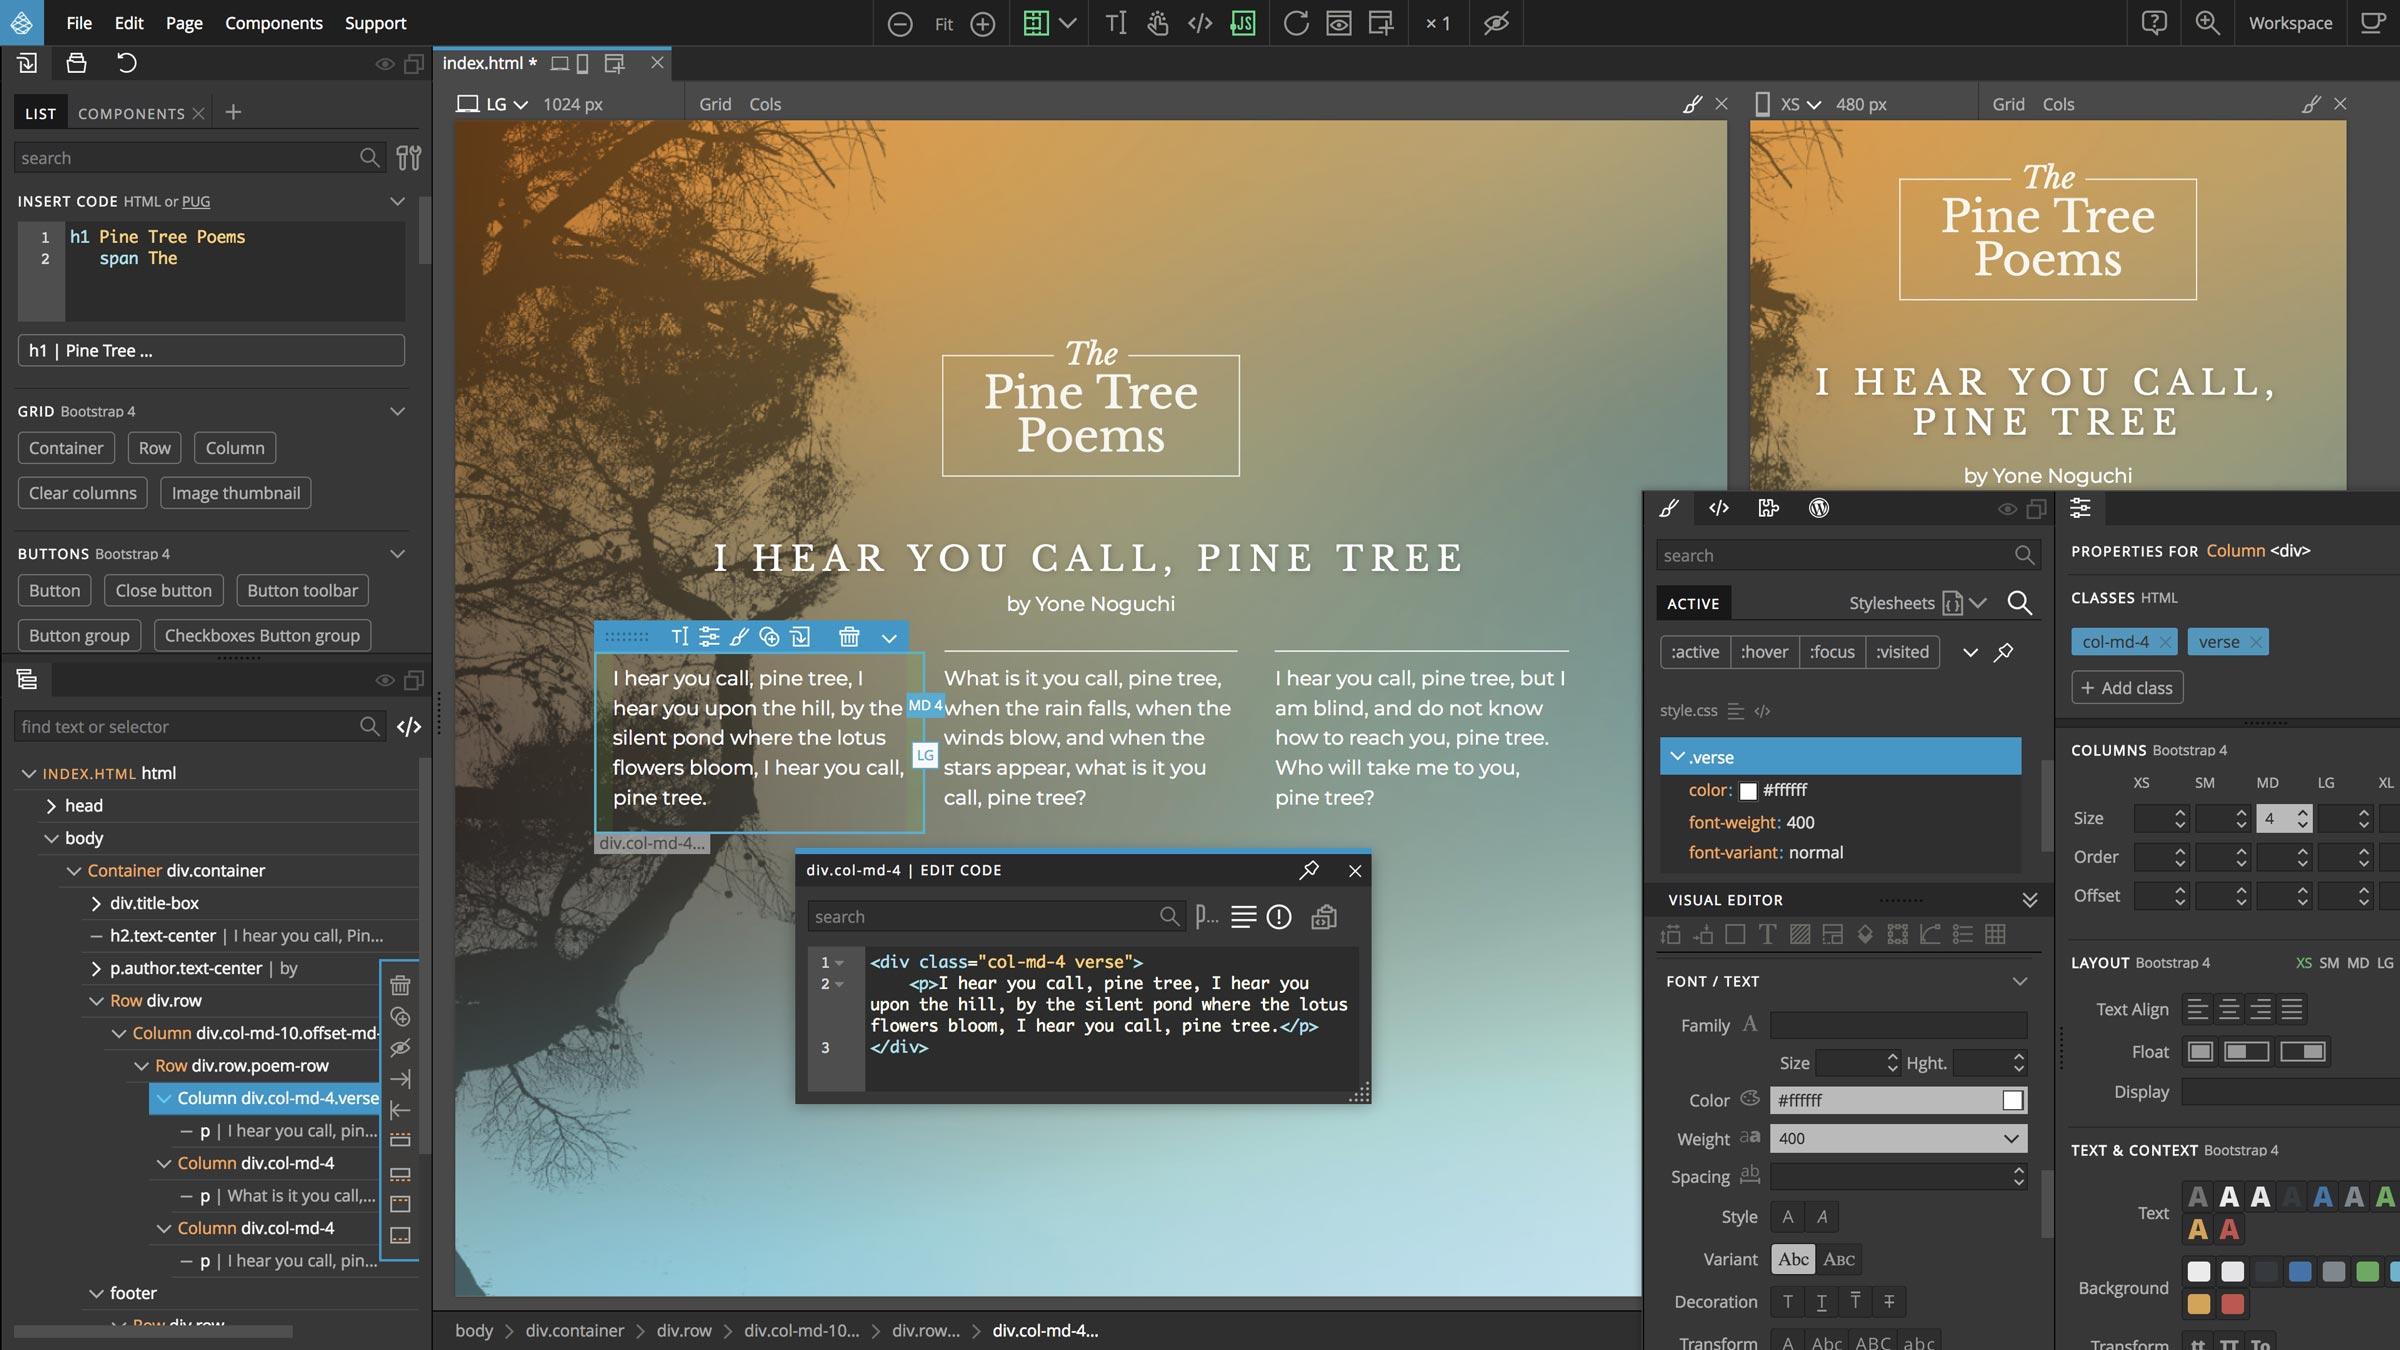 Humane Technologies Pinegrow Web Editor 5.0